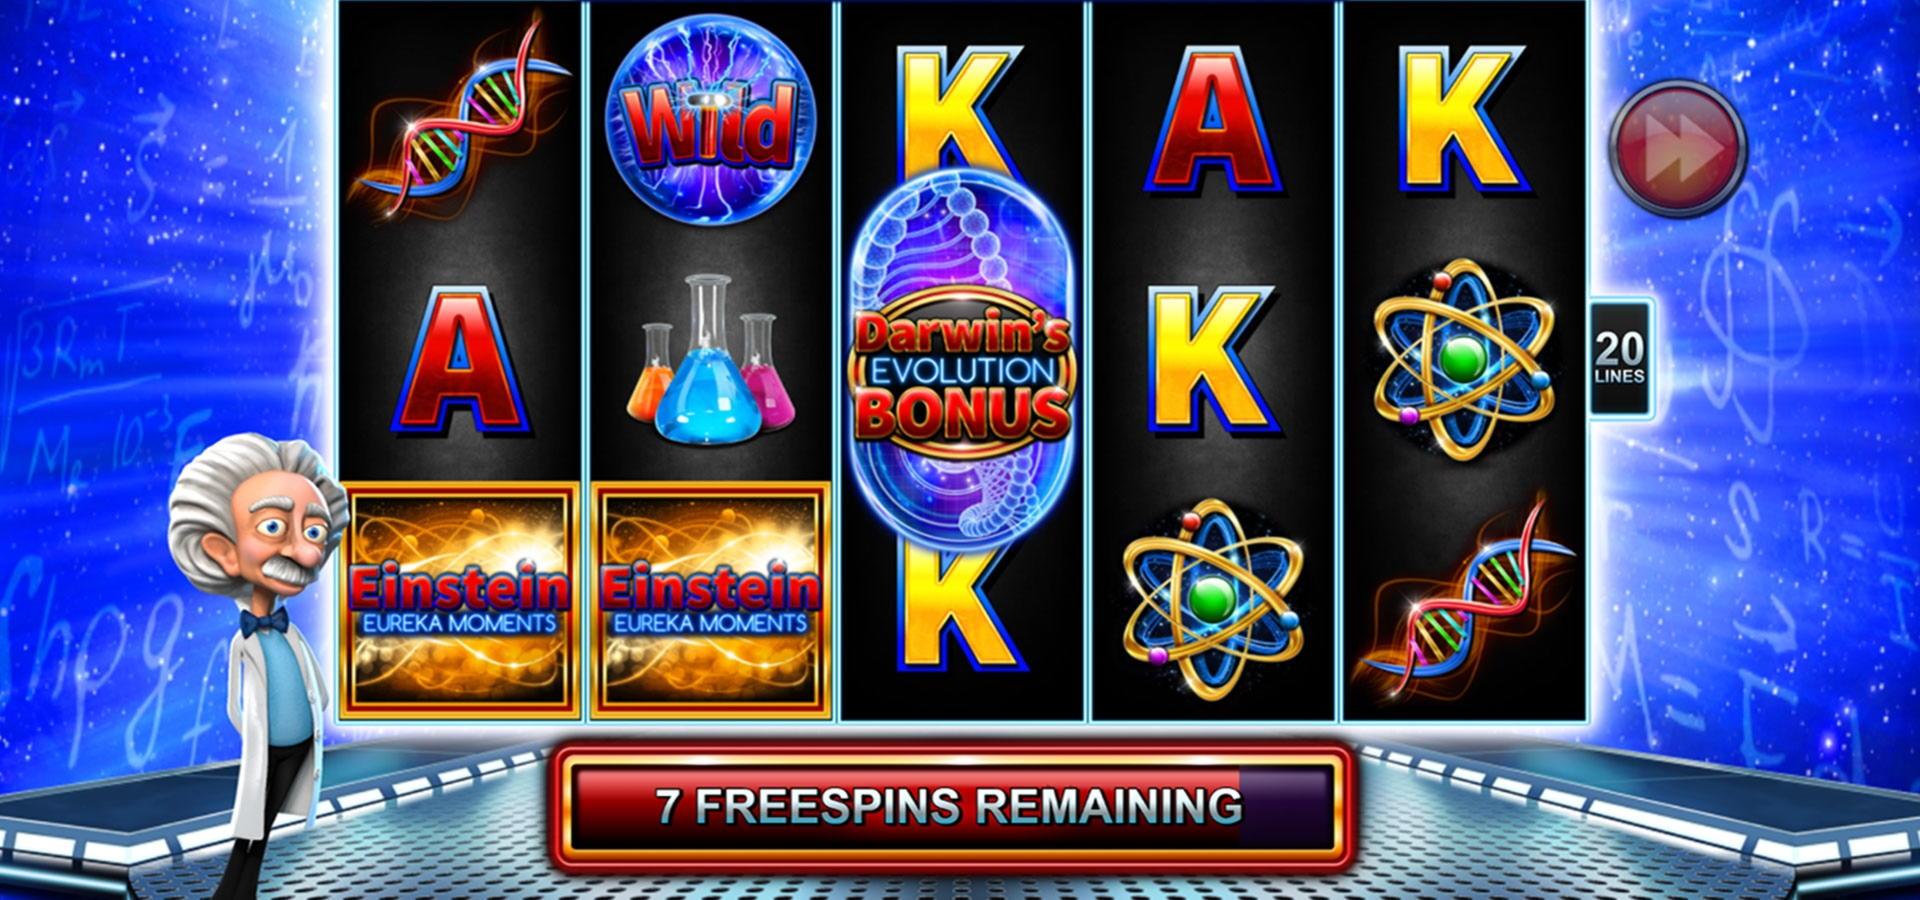 185 bezmaksas kazino spins pie spēka spin